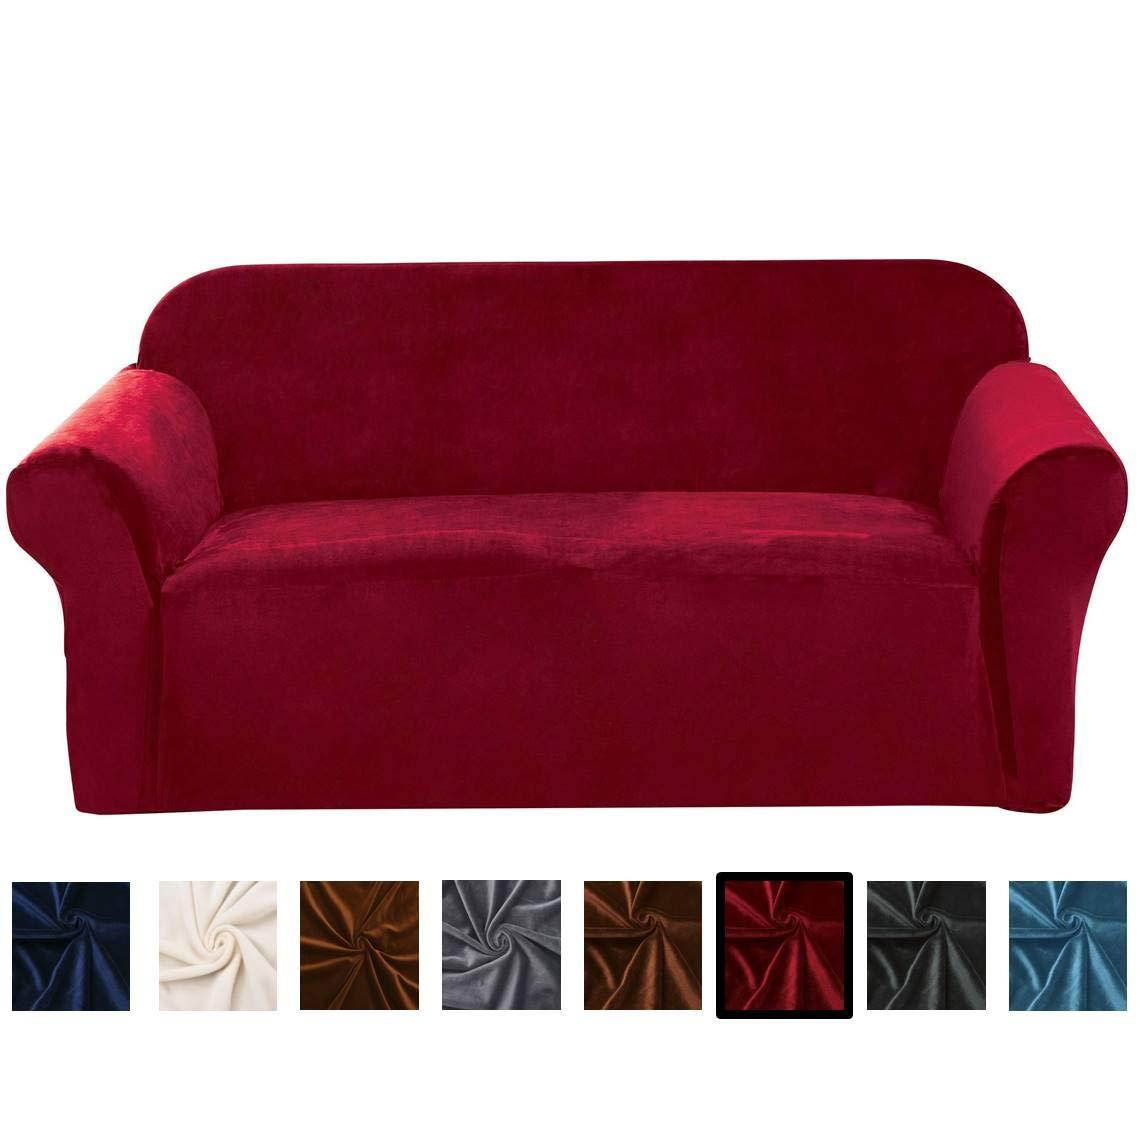 Outstanding Argstar Velvet Plush Loveseat Furniture Cover Sofa Slipcover Love Seat Covers For Living Room Wine Red Pabps2019 Chair Design Images Pabps2019Com